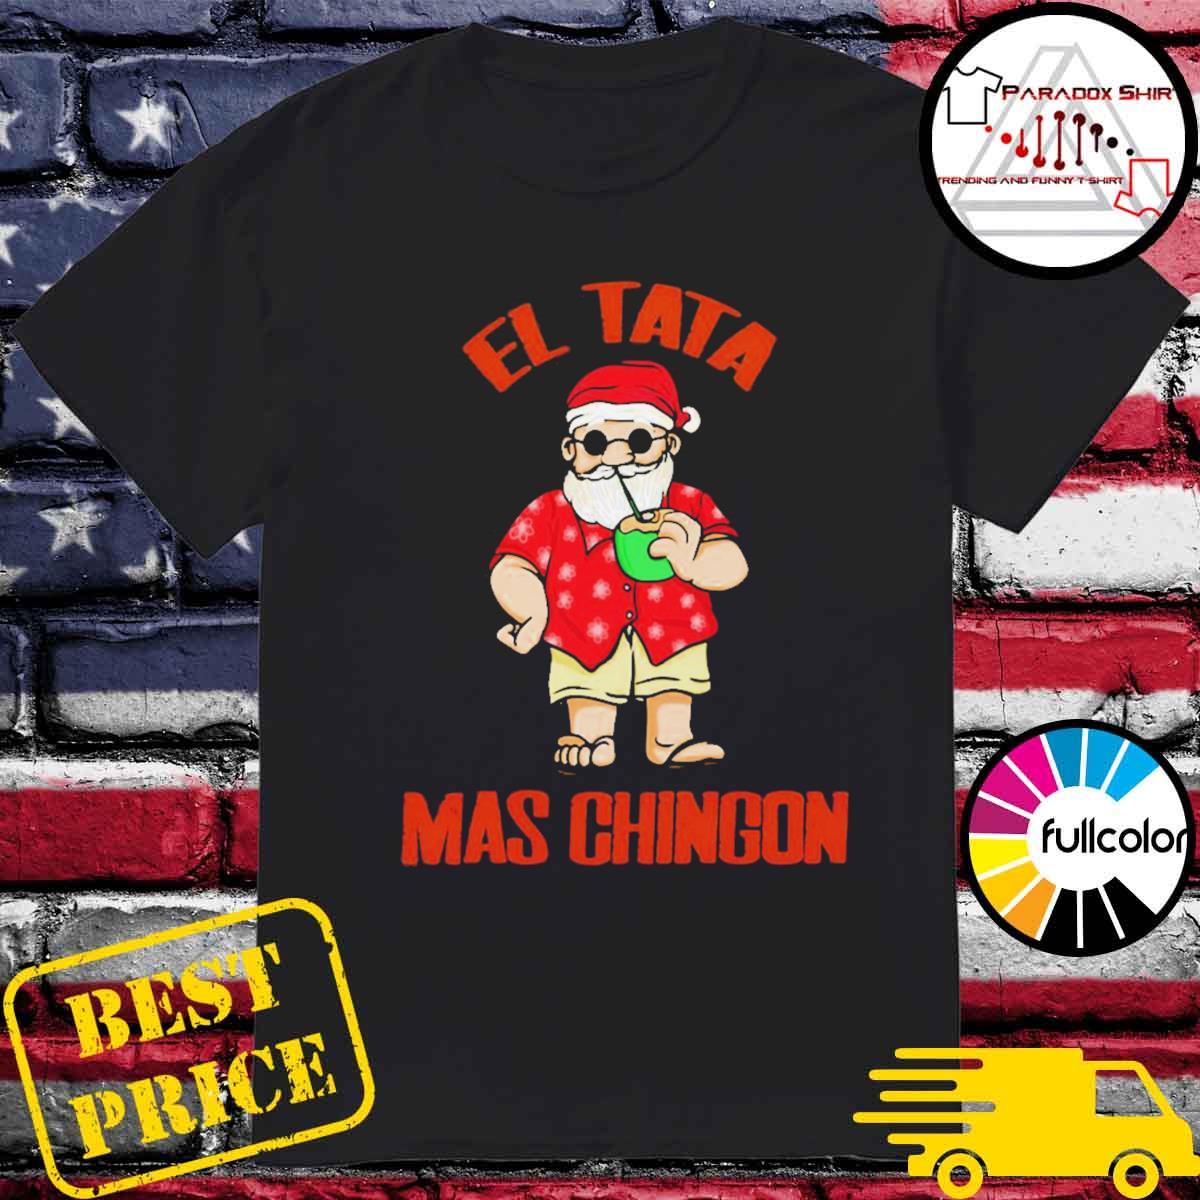 El tata mas Chingon Santa claus shirt